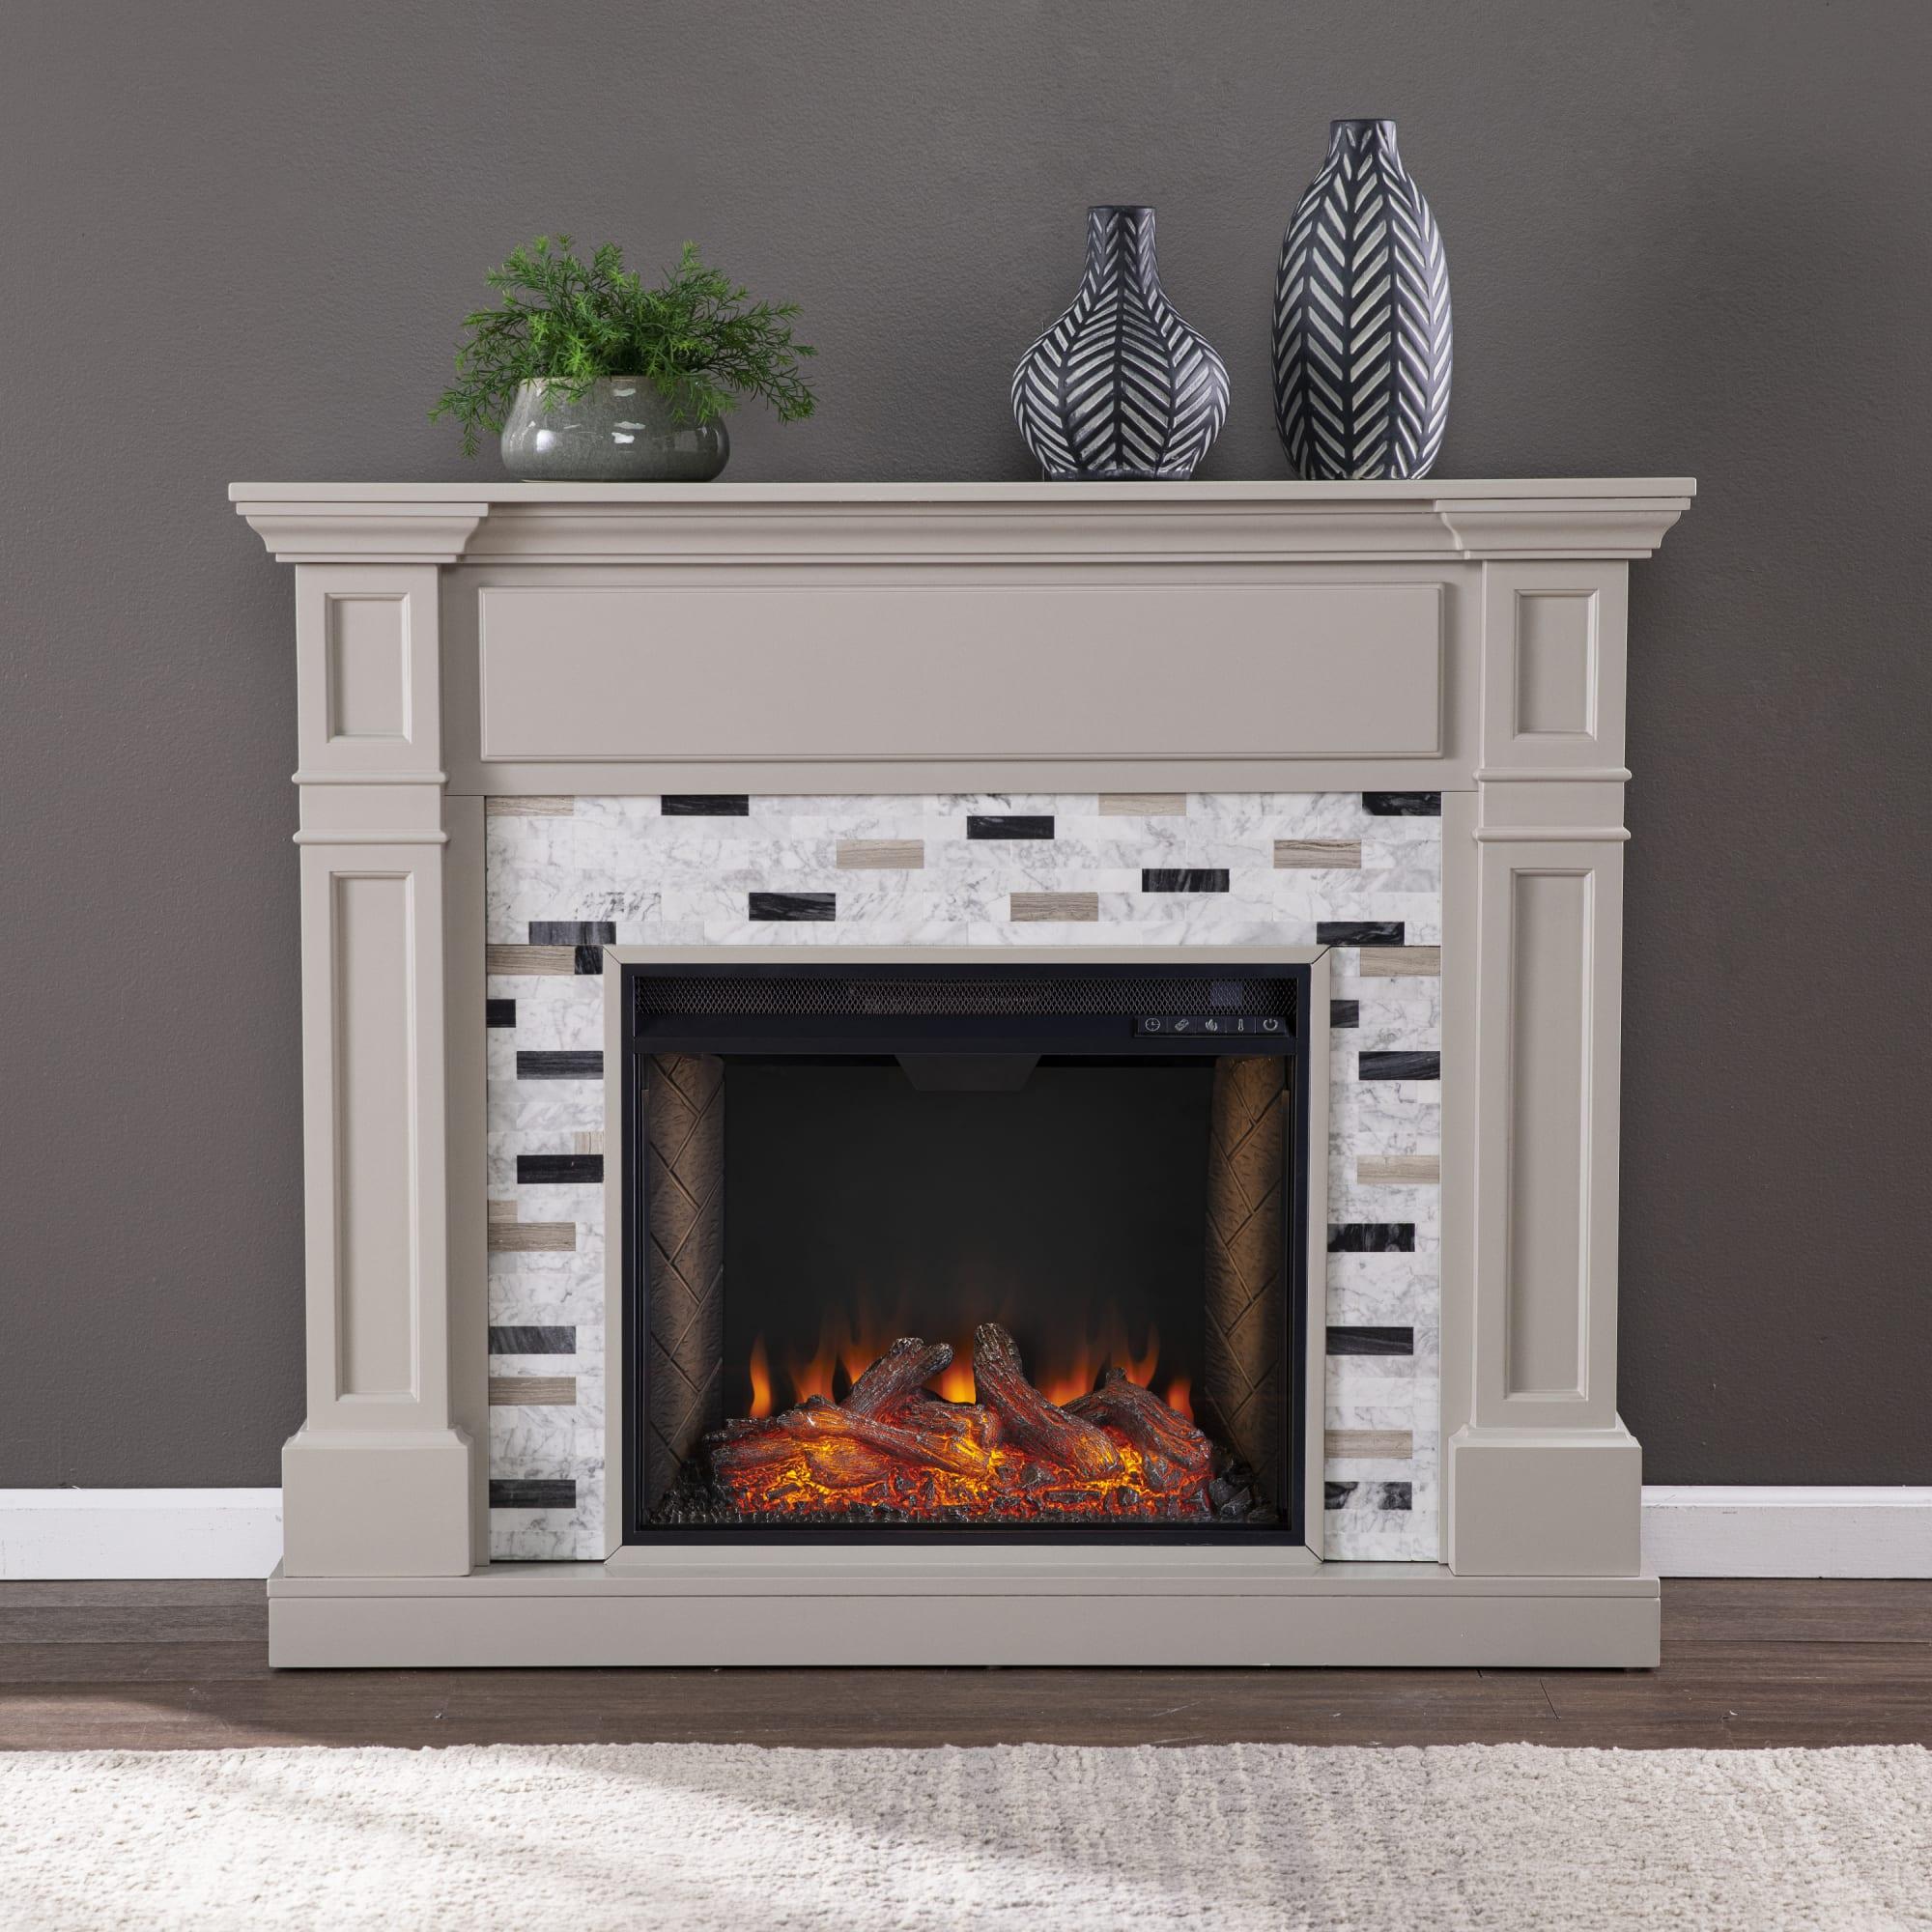 Delphine Smart Fireplace